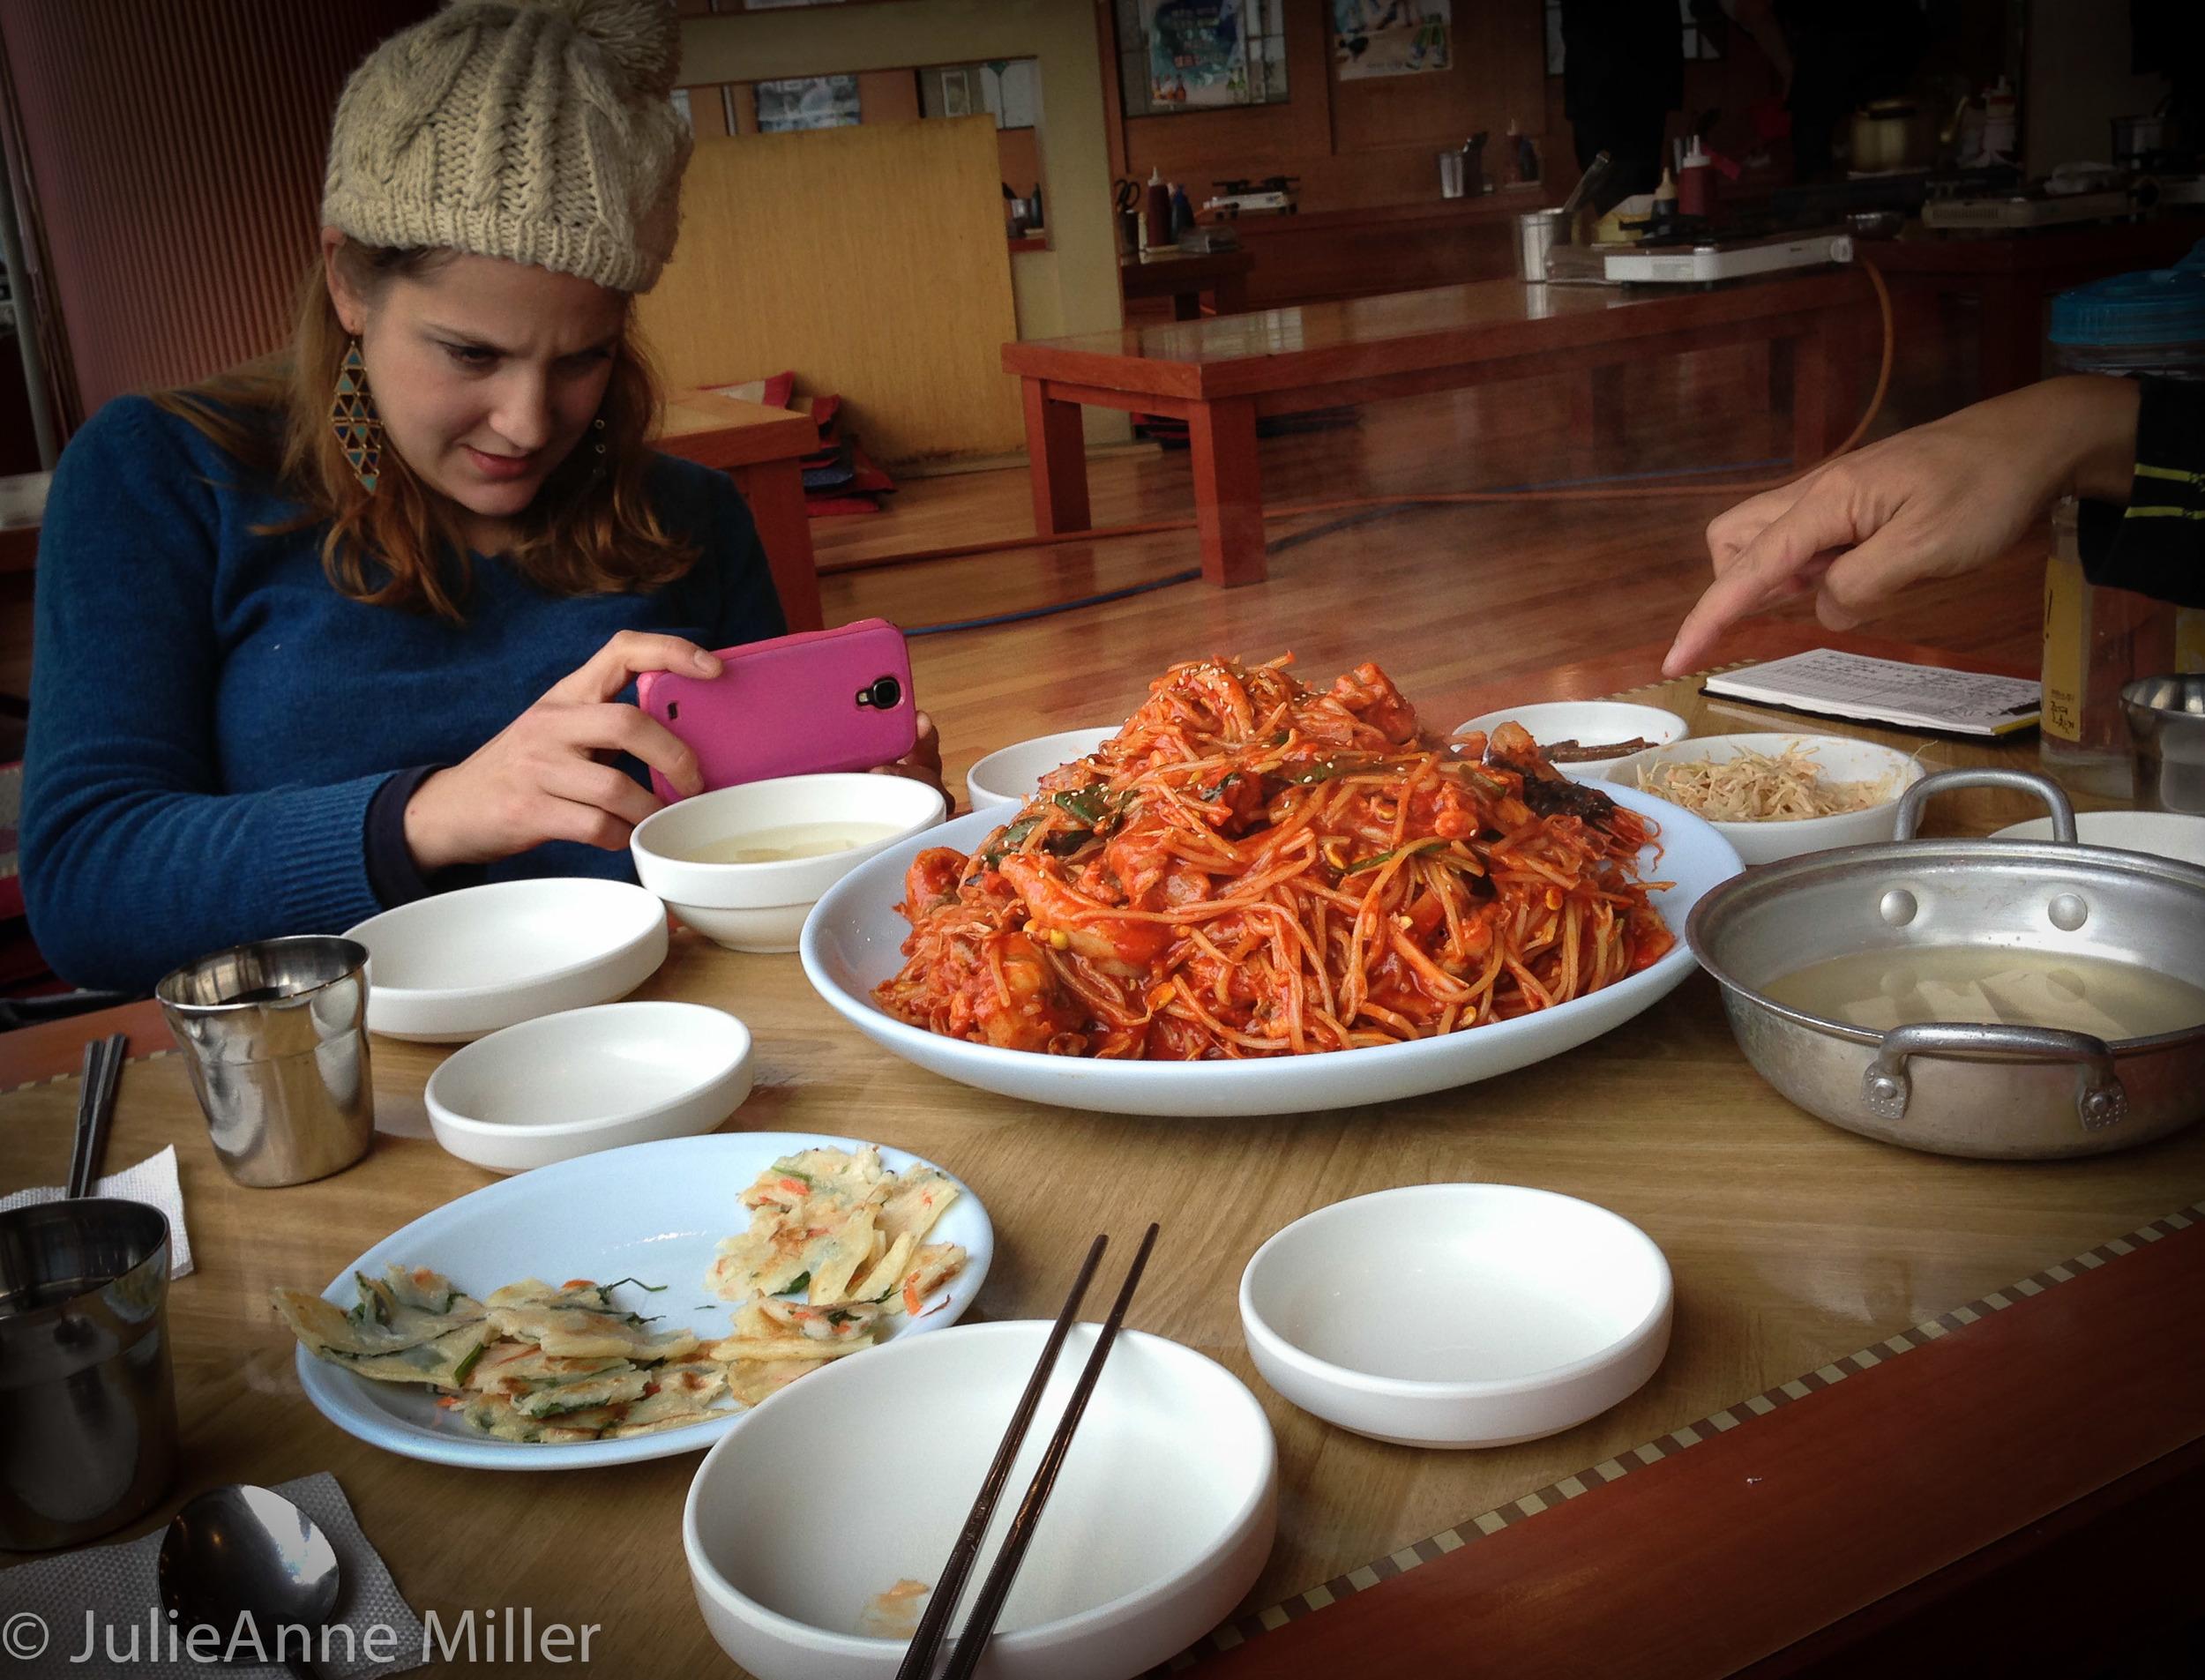 My friend Hannah at Songjin Agu Tang restaurant in Inchon, South Korea.